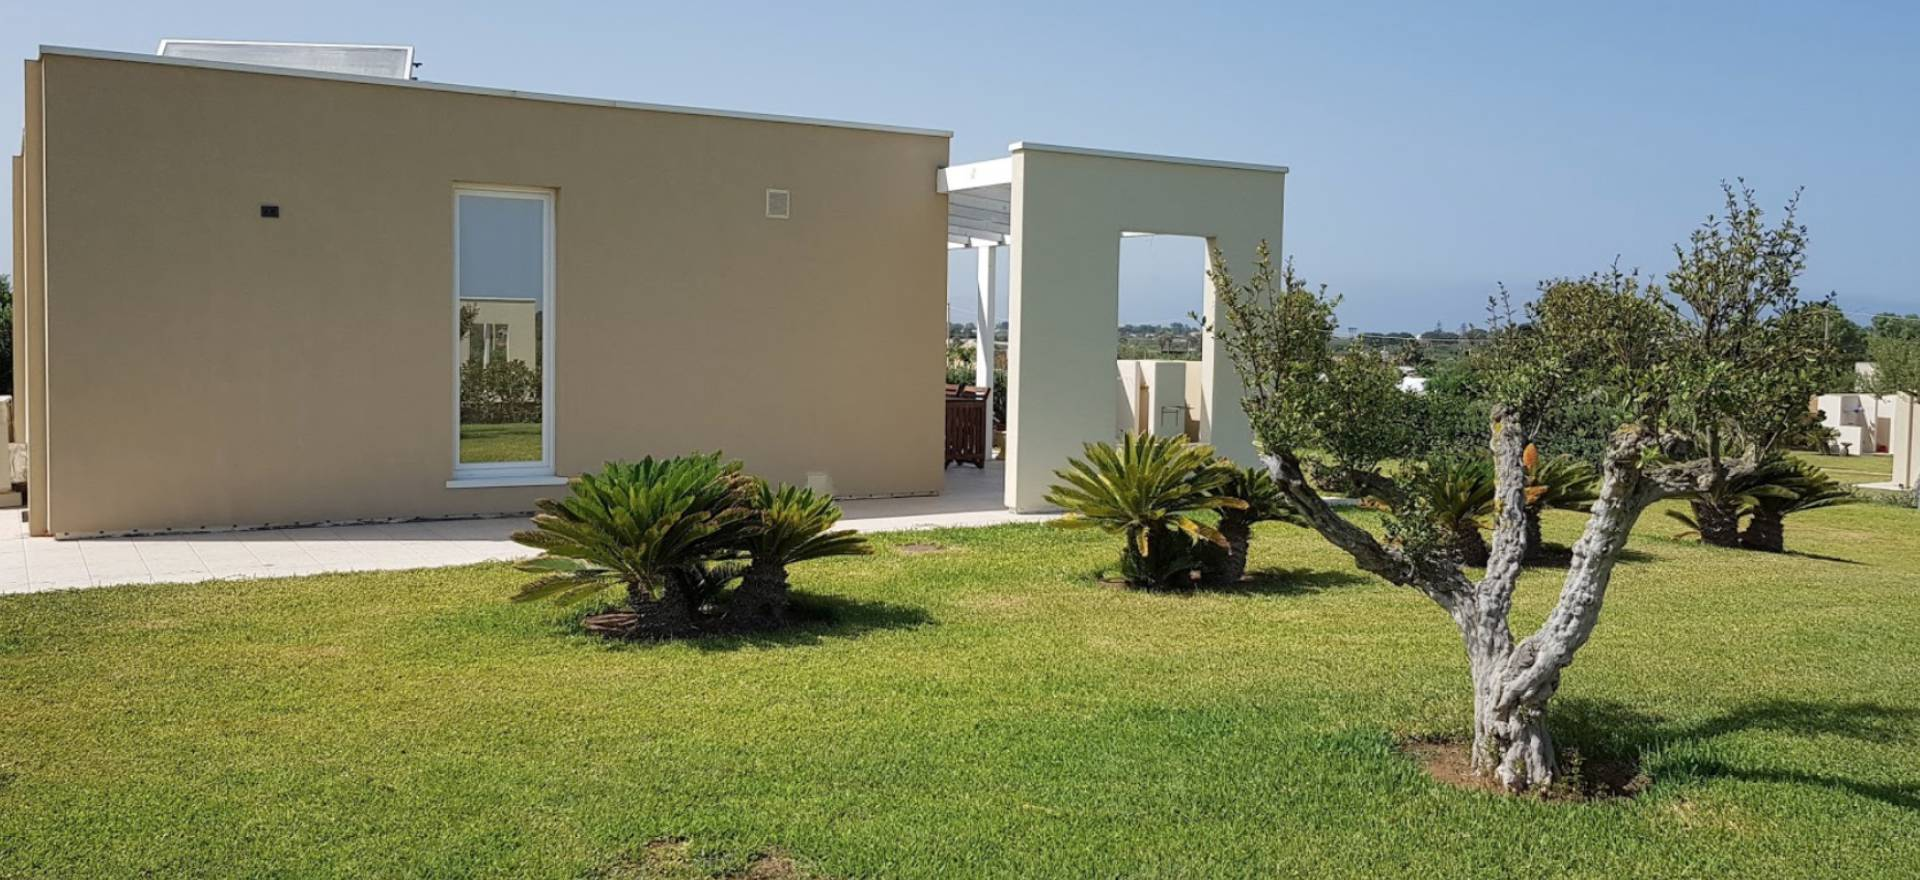 Agriturismo Sicilia Lussuoso agriturismo vicino alla spiaggia